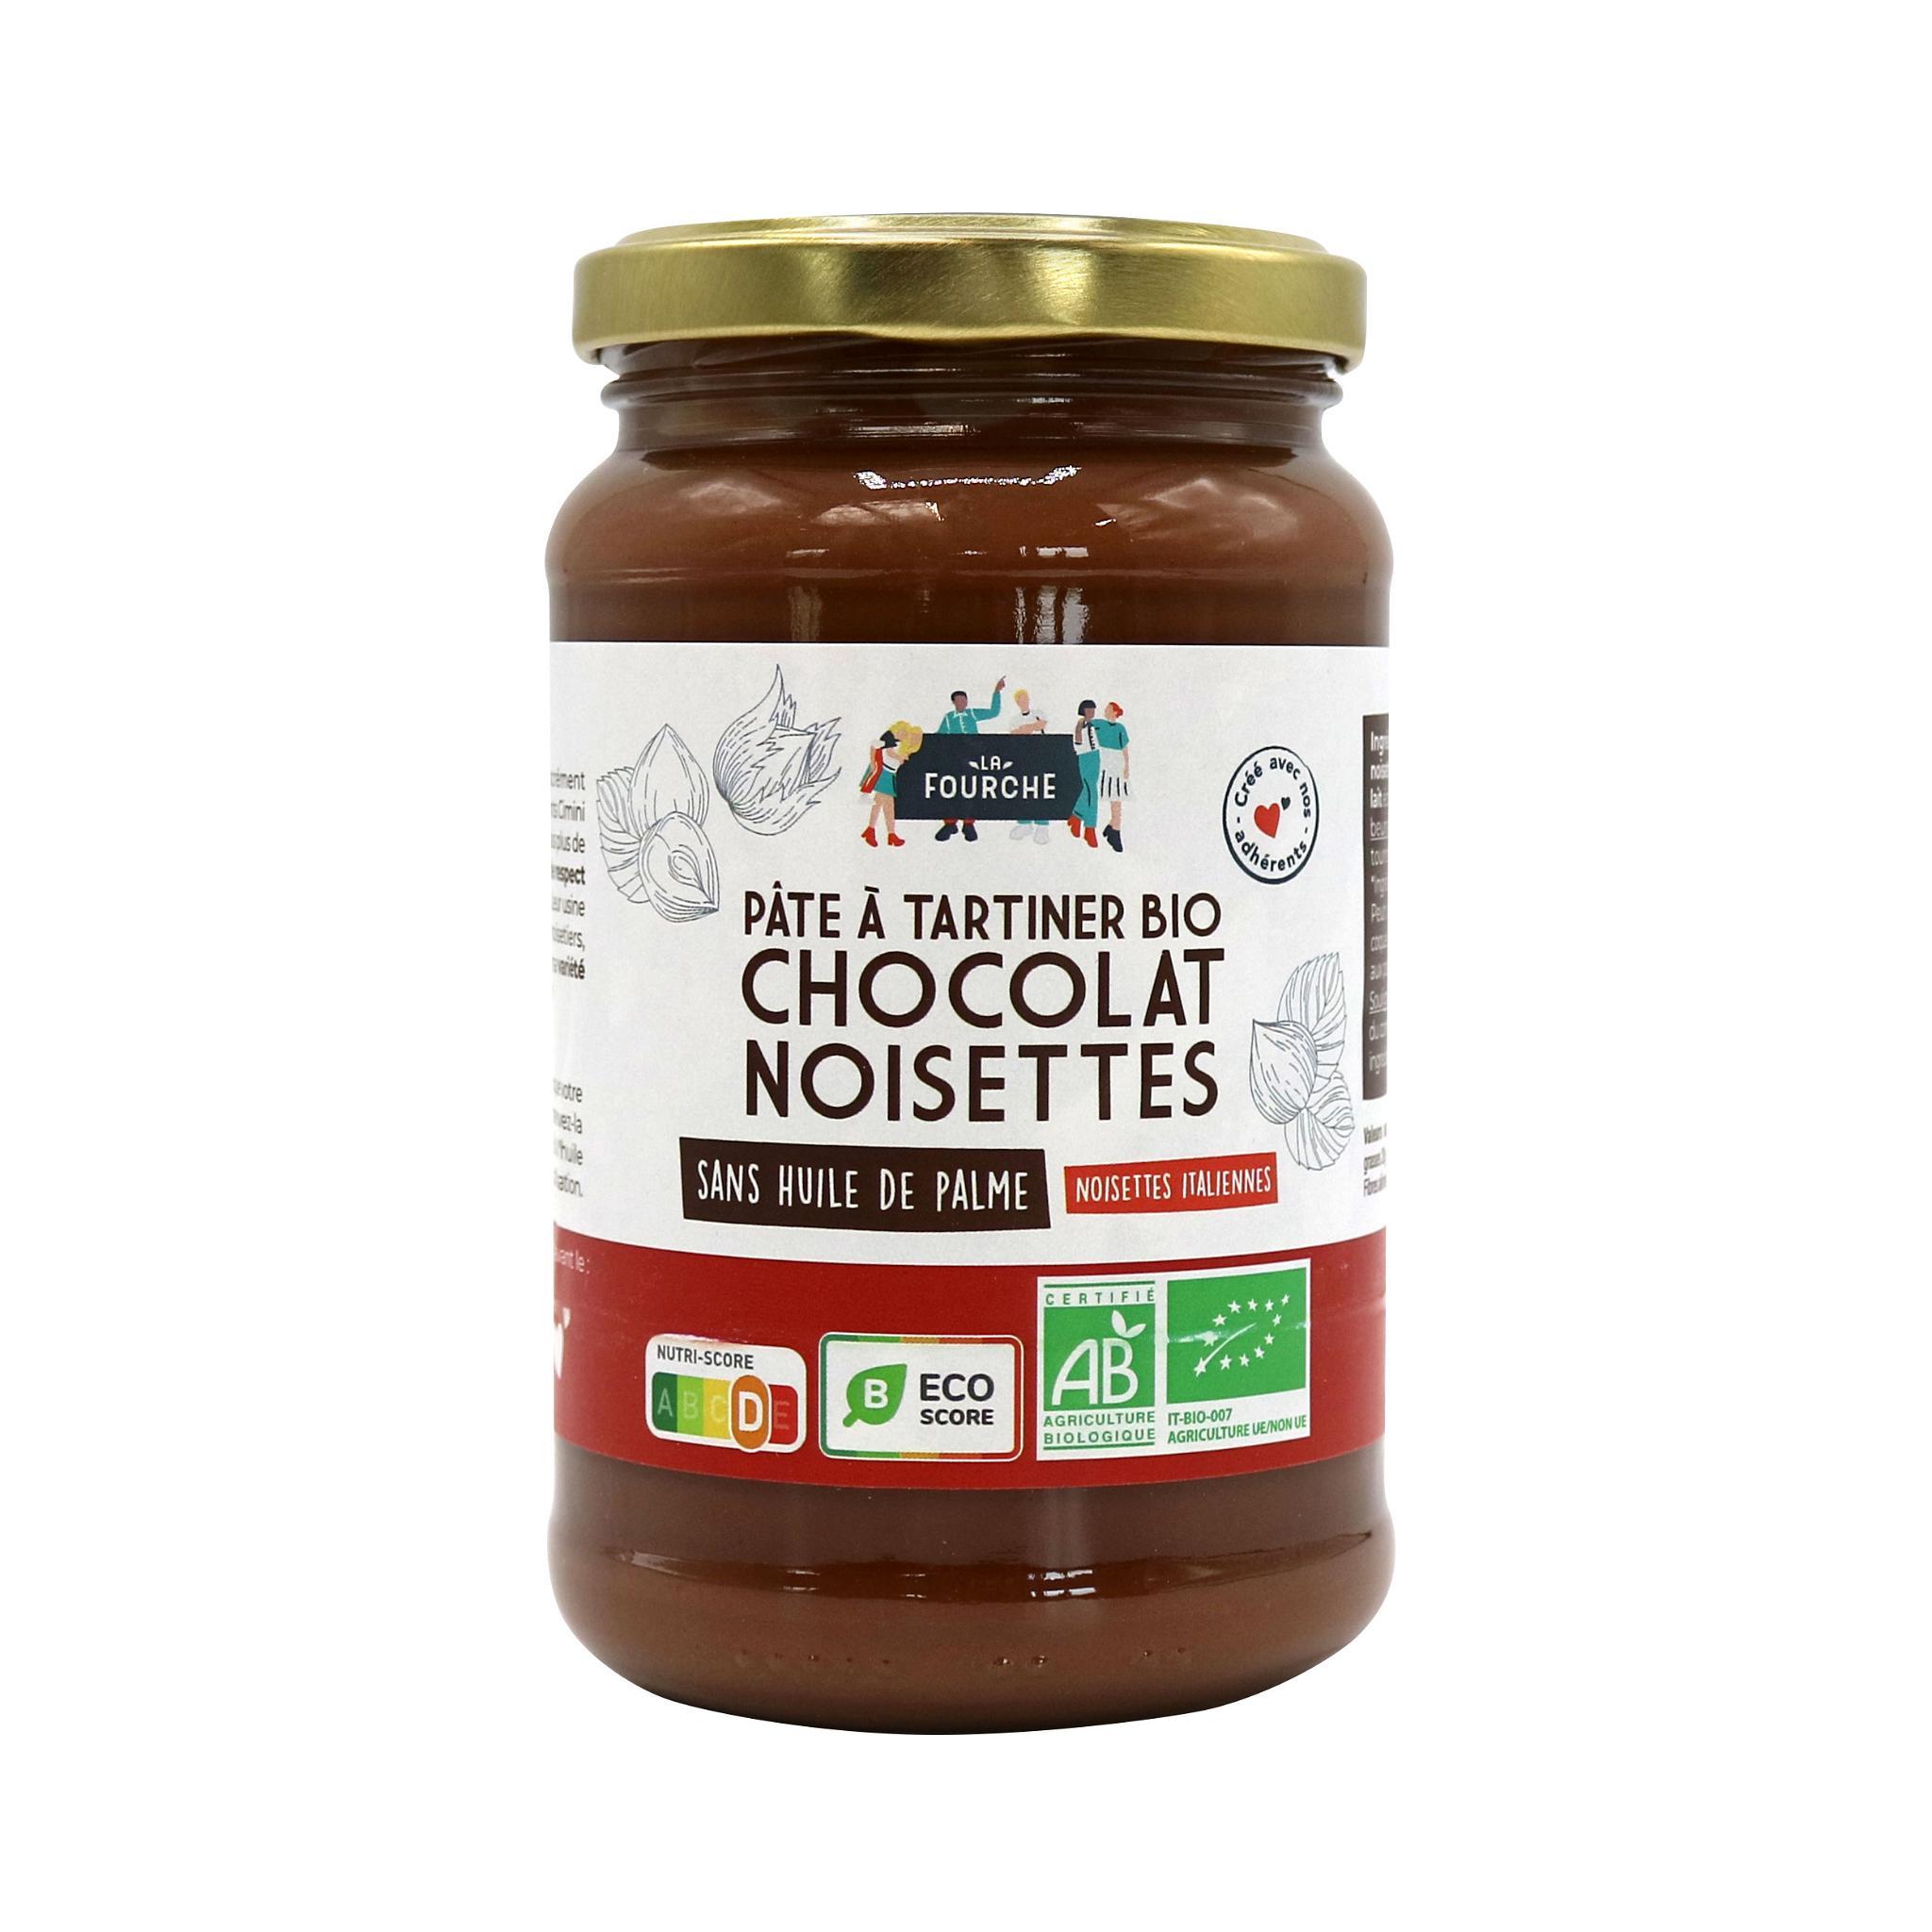 img-la-fourche-pate-a-tartiner-chocolat-noisettes-bio-350g